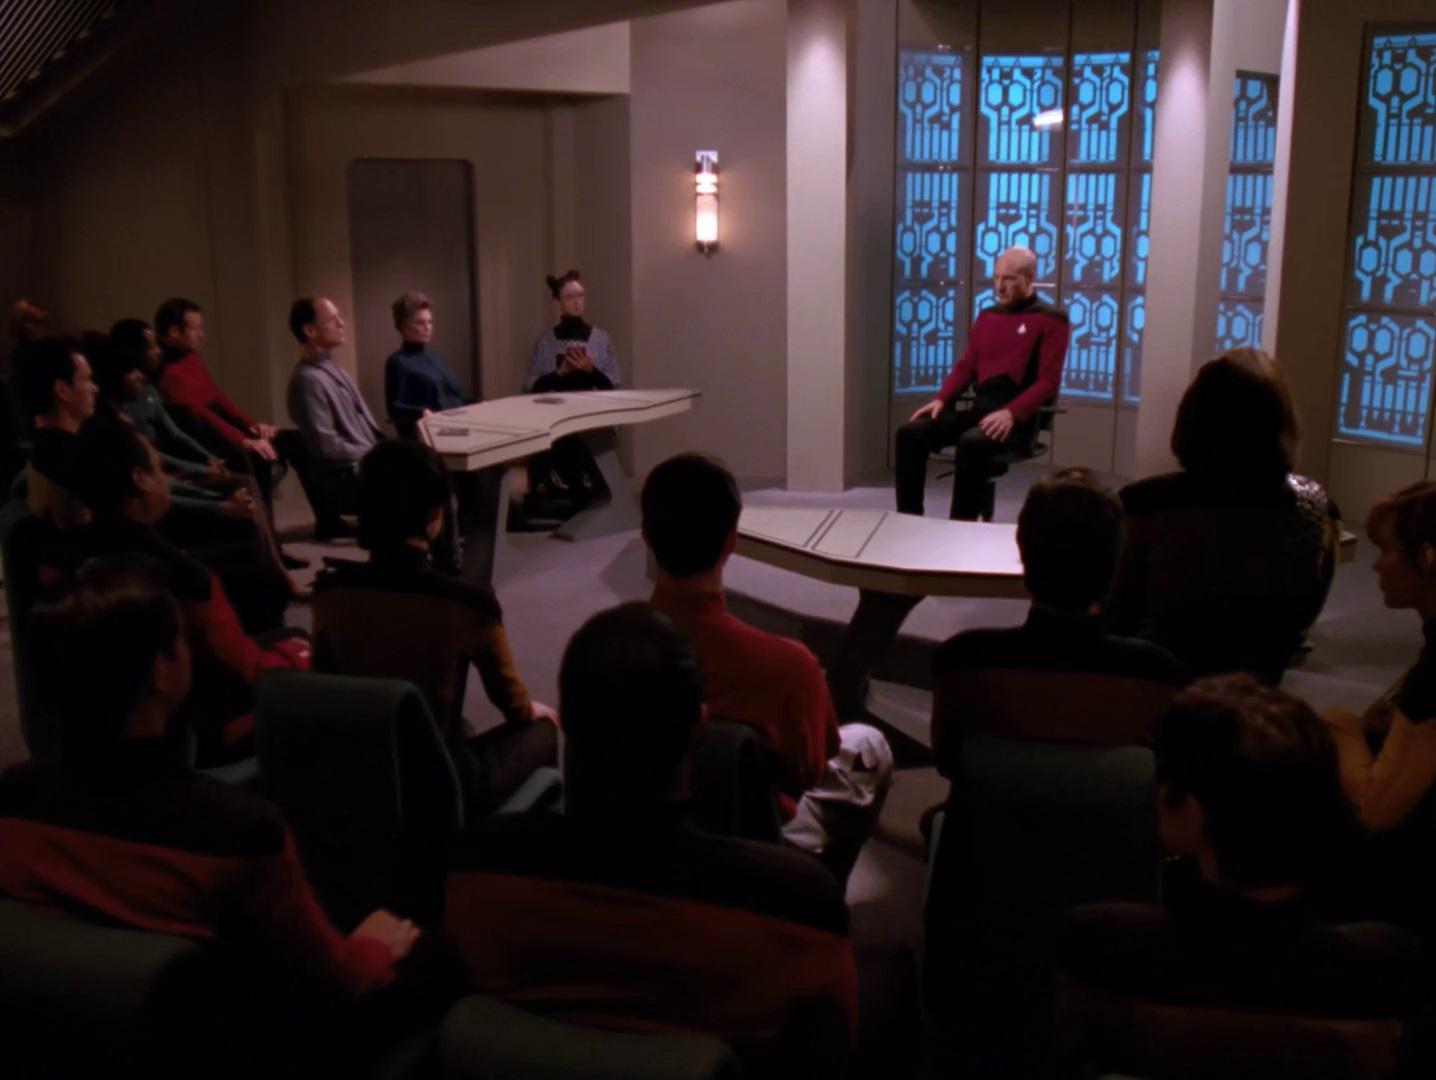 Picard in interrogation room.jpg